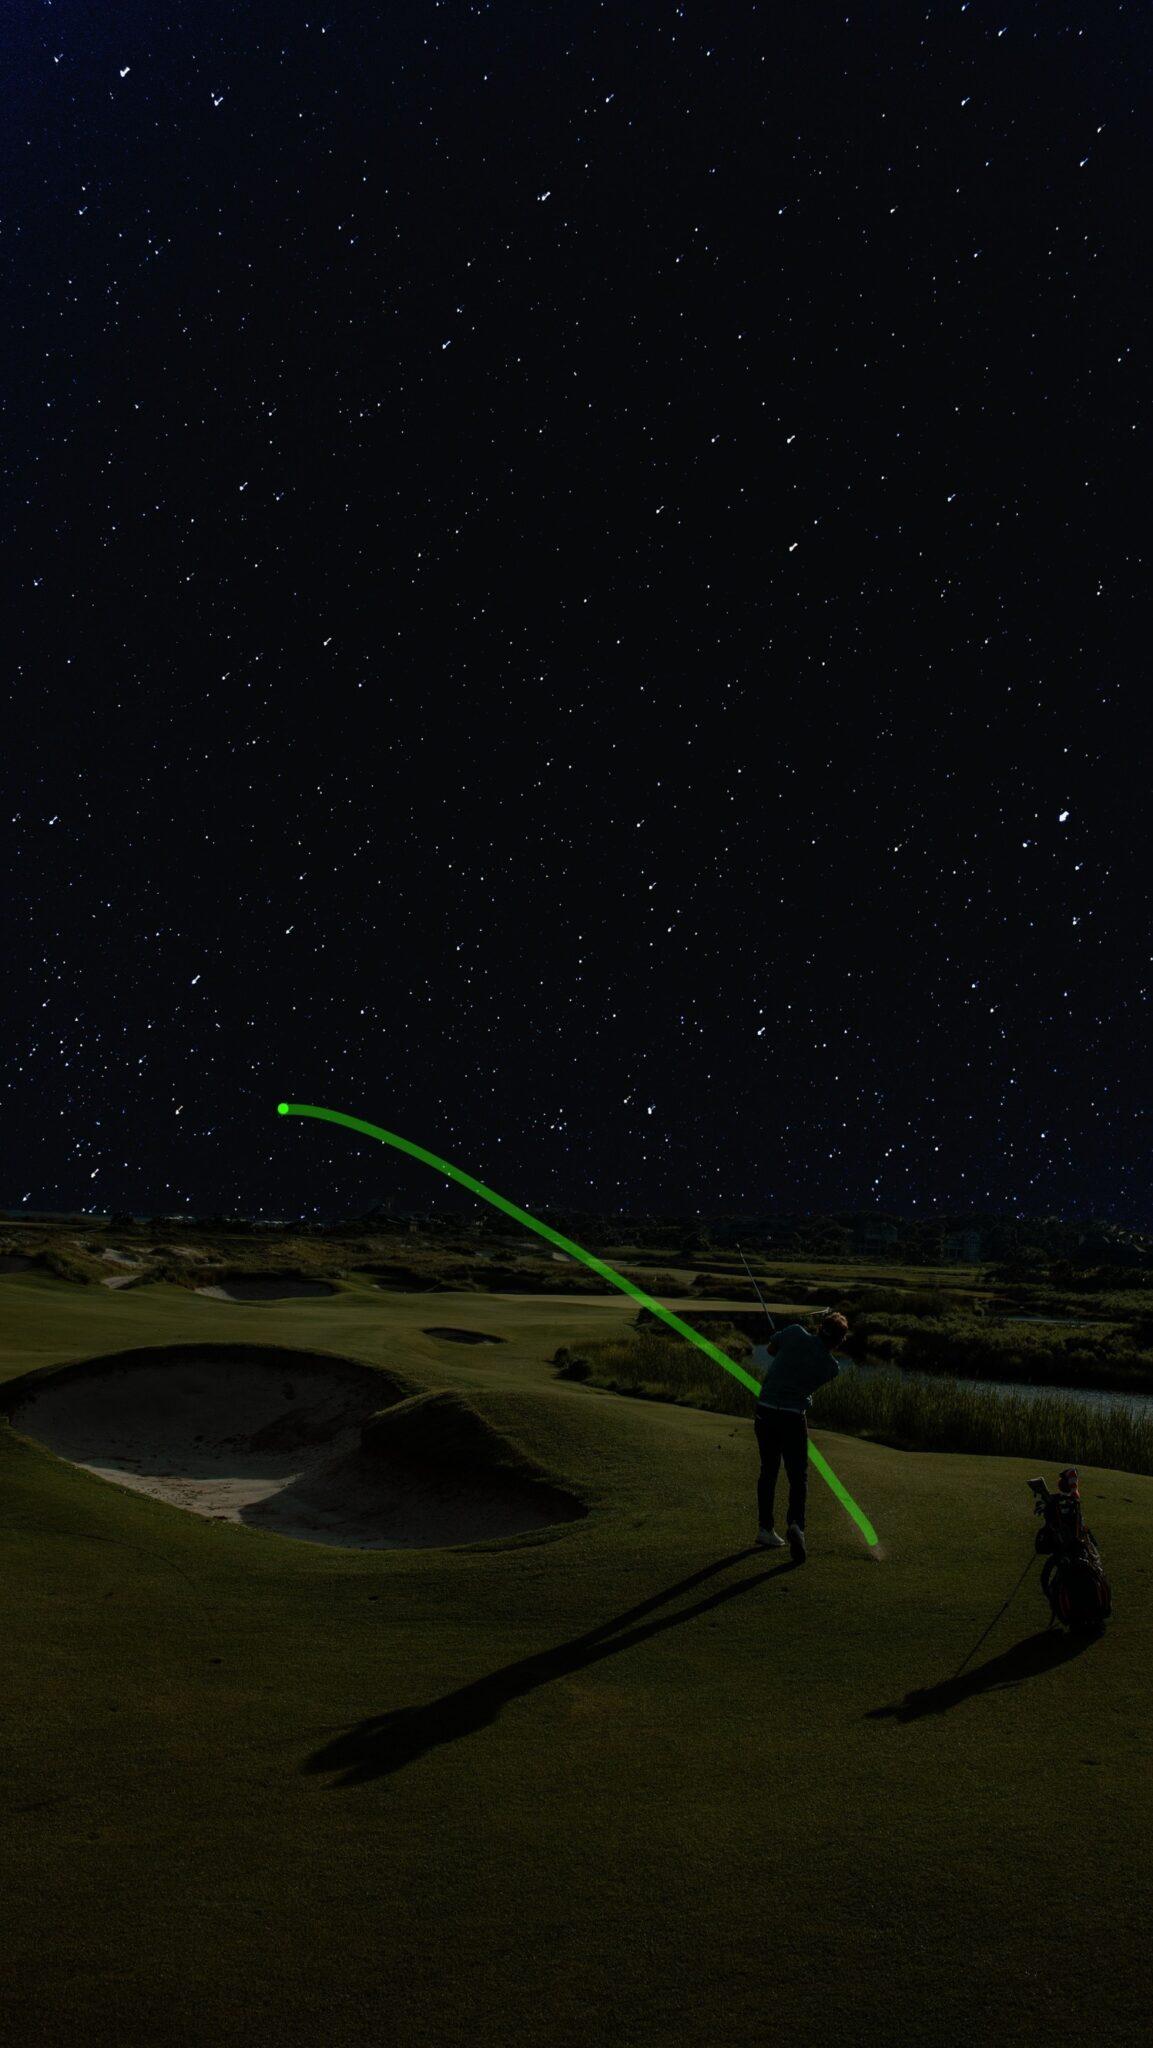 Night Golf Image updated